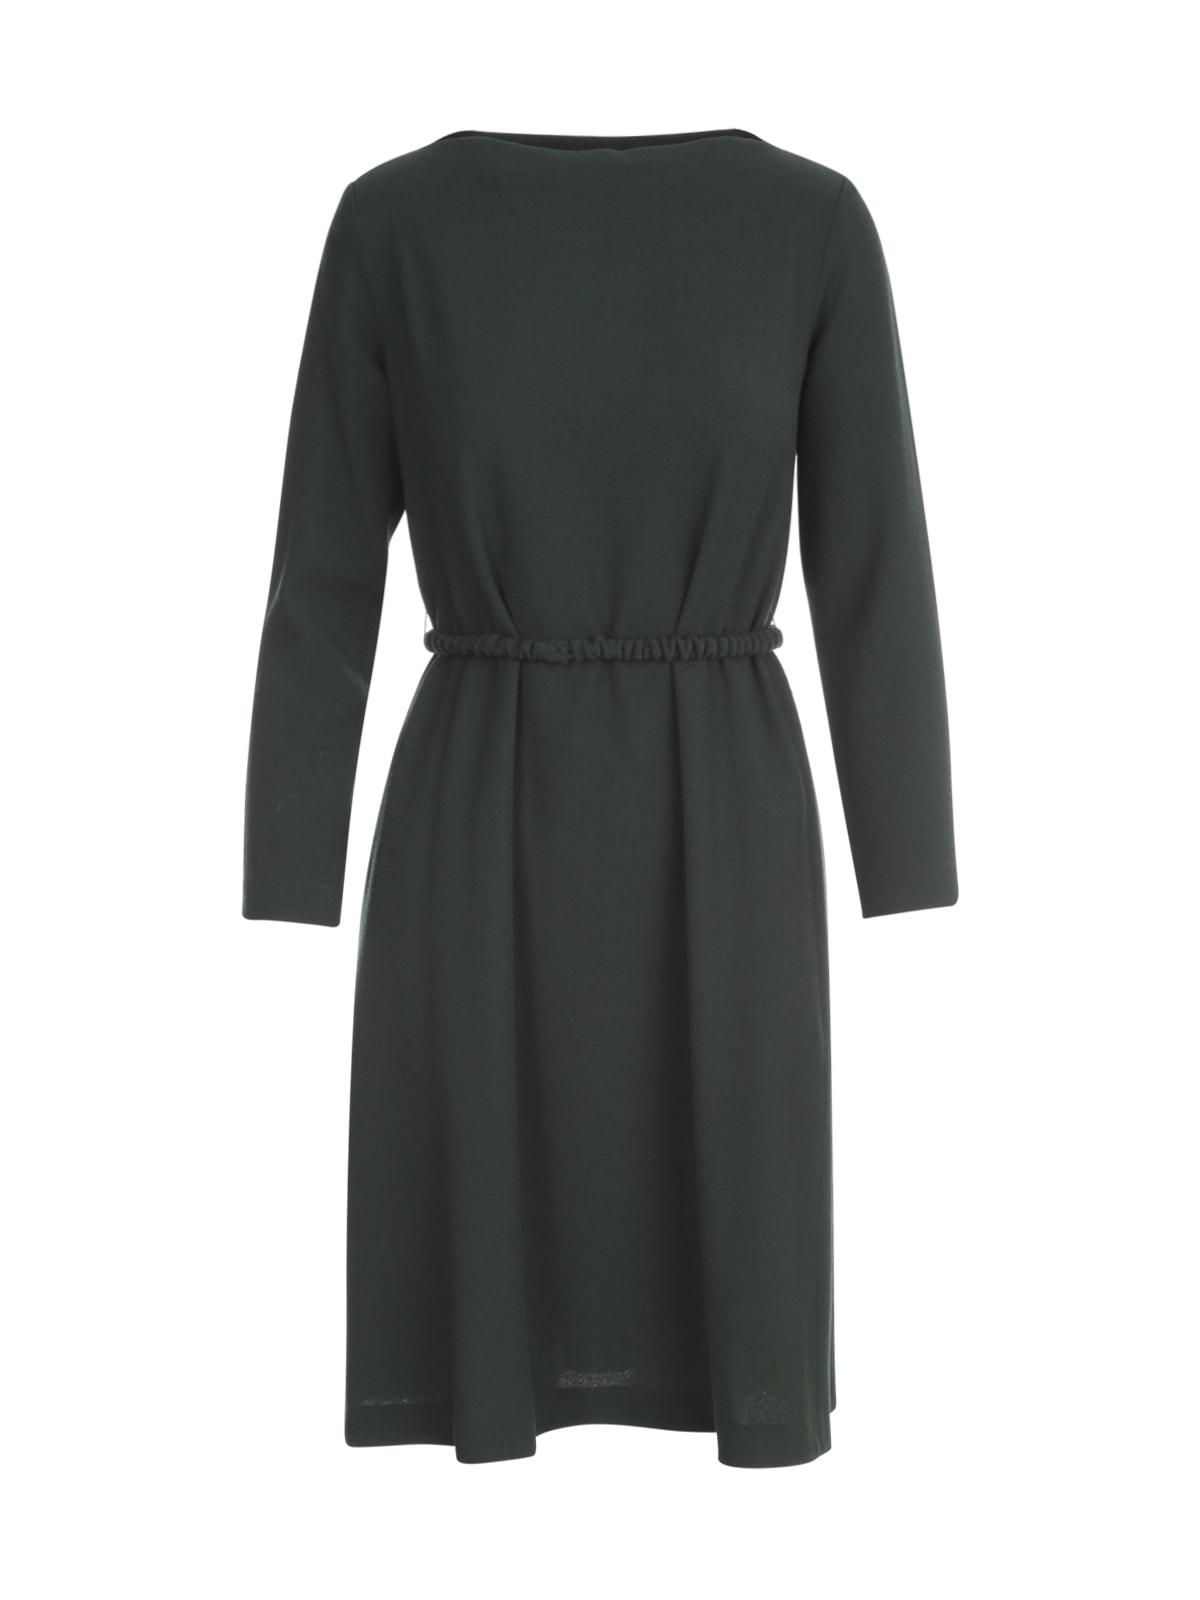 Crepe L/s Dress W/a Line Belted Skirt